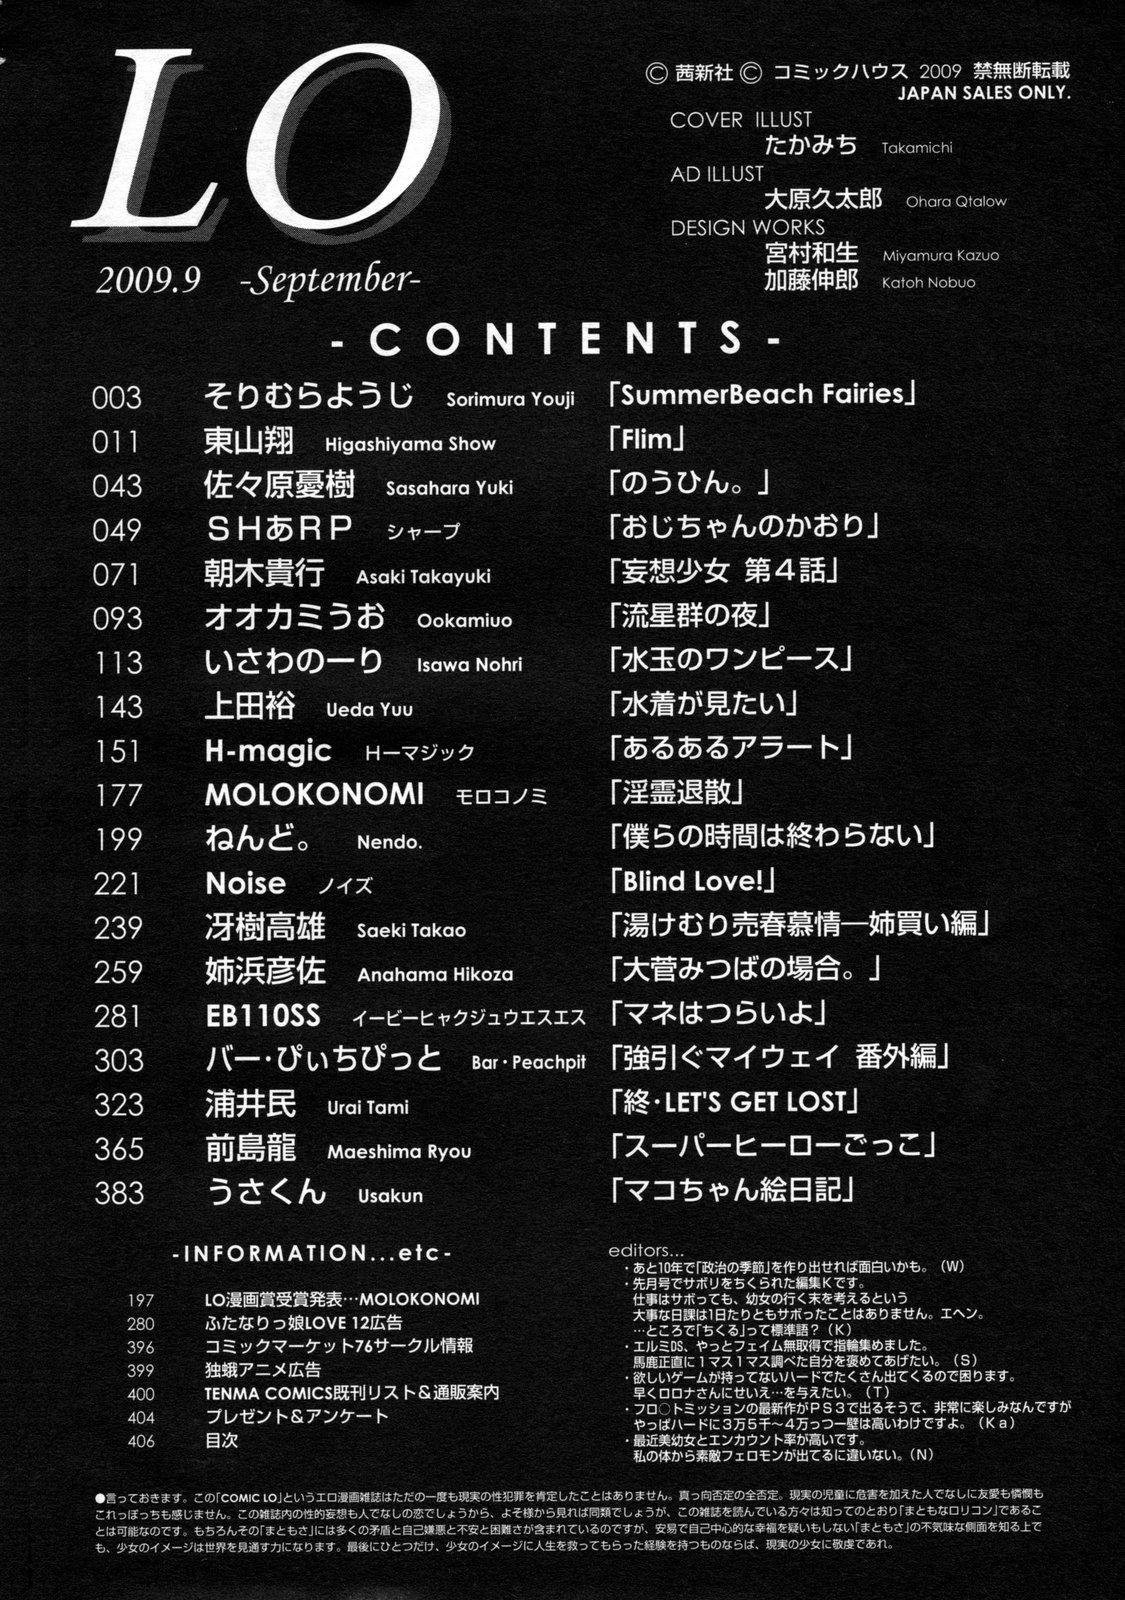 COMIC LO 2009-09 Vol. 66 406